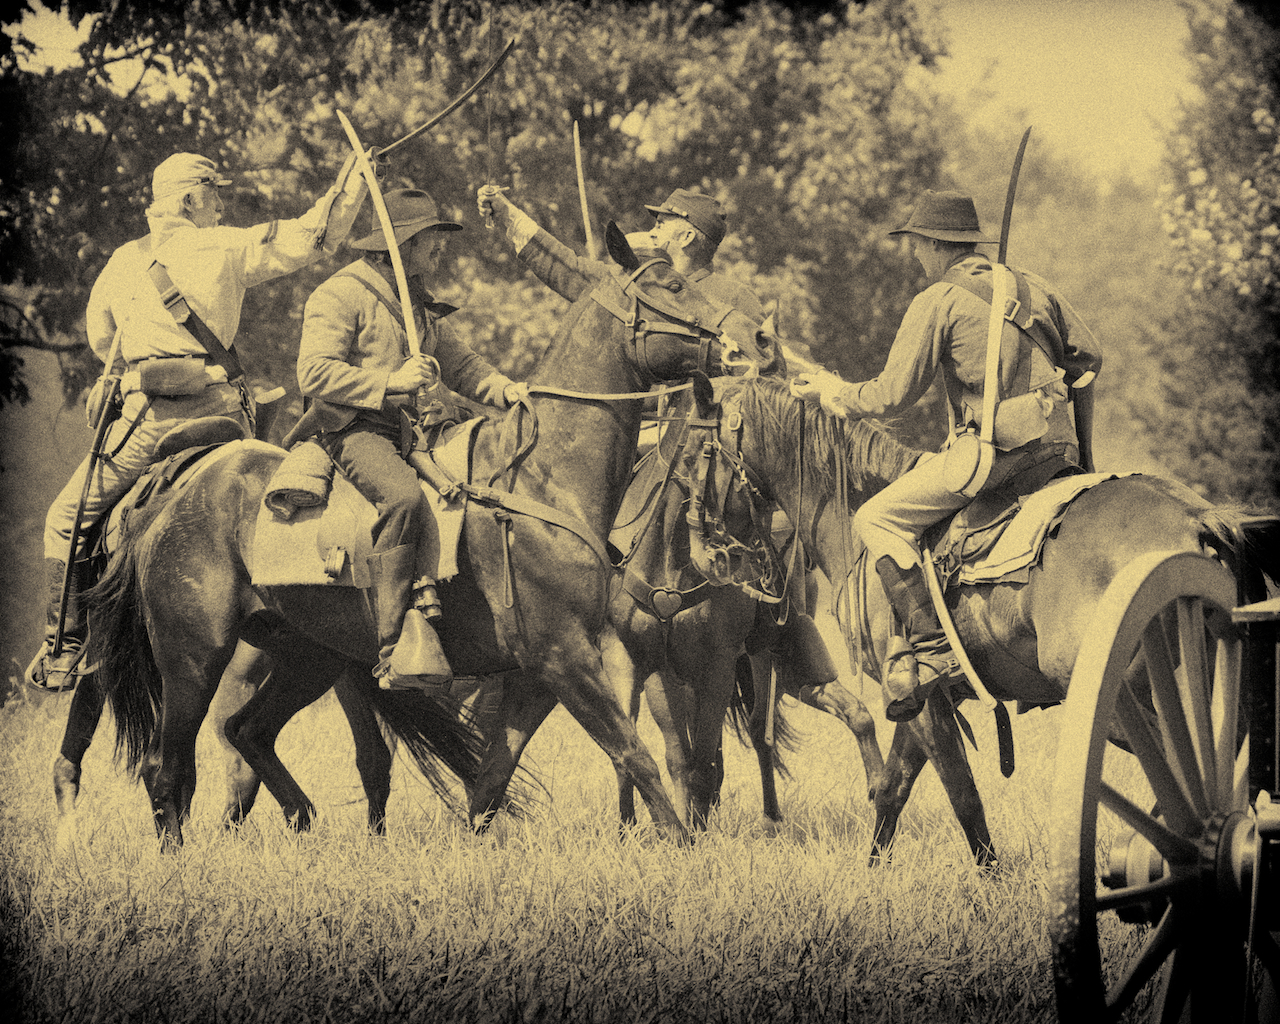 IDMkIV_Civil War Battle_2010-07-10_5270_Original.jpg